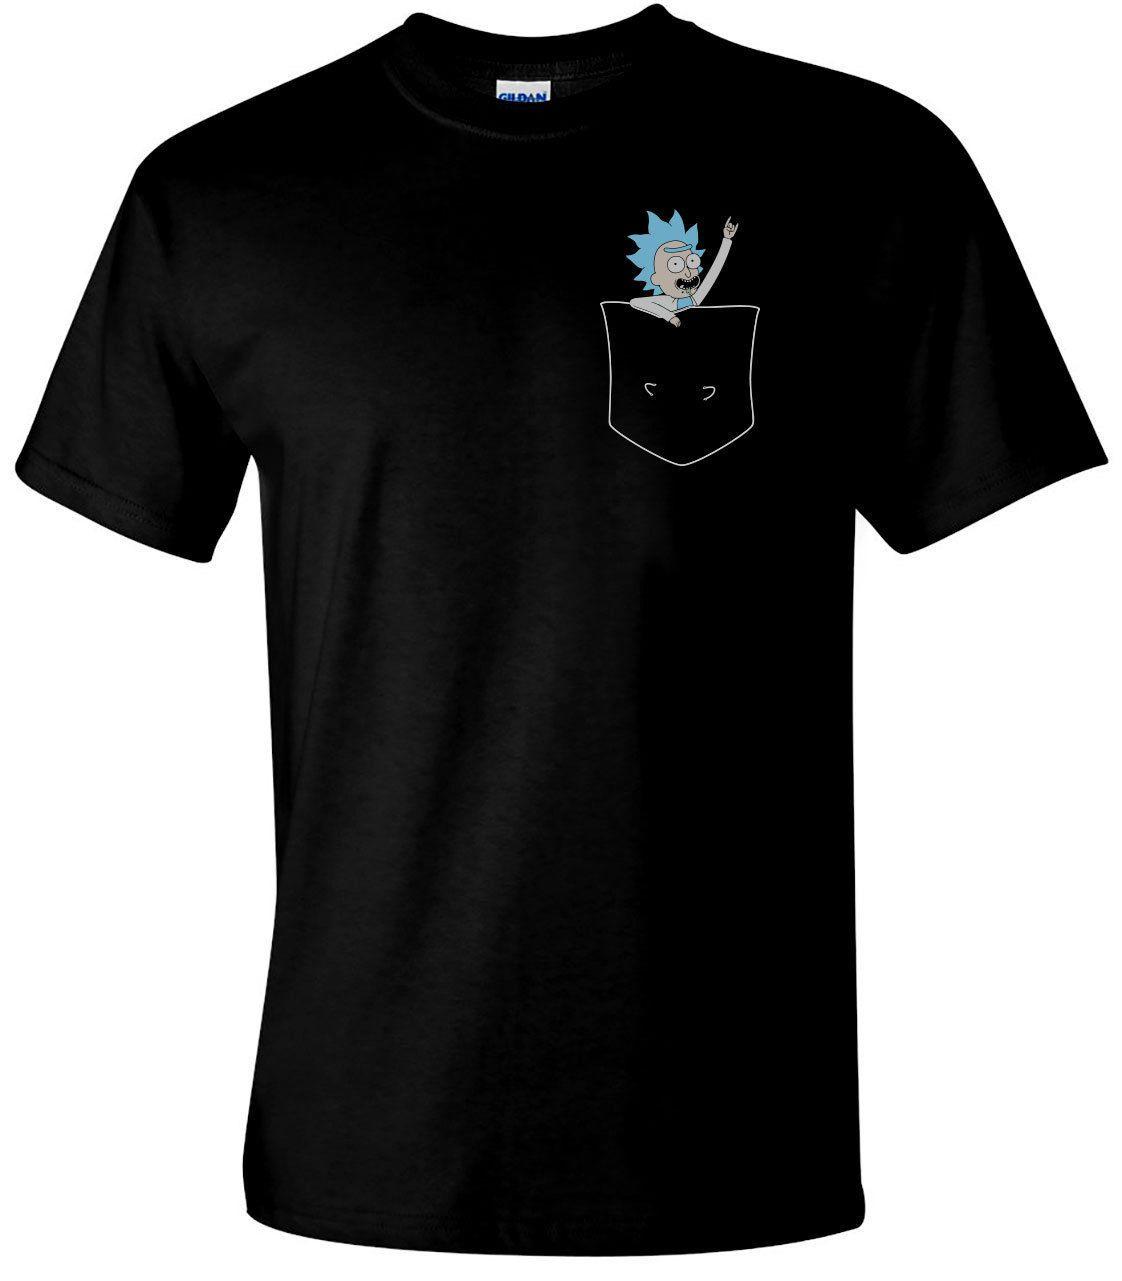 6938d289a ... Rick & Morty T Shirt TINY RICK POCKET Men S Funny T Shirts Christmas